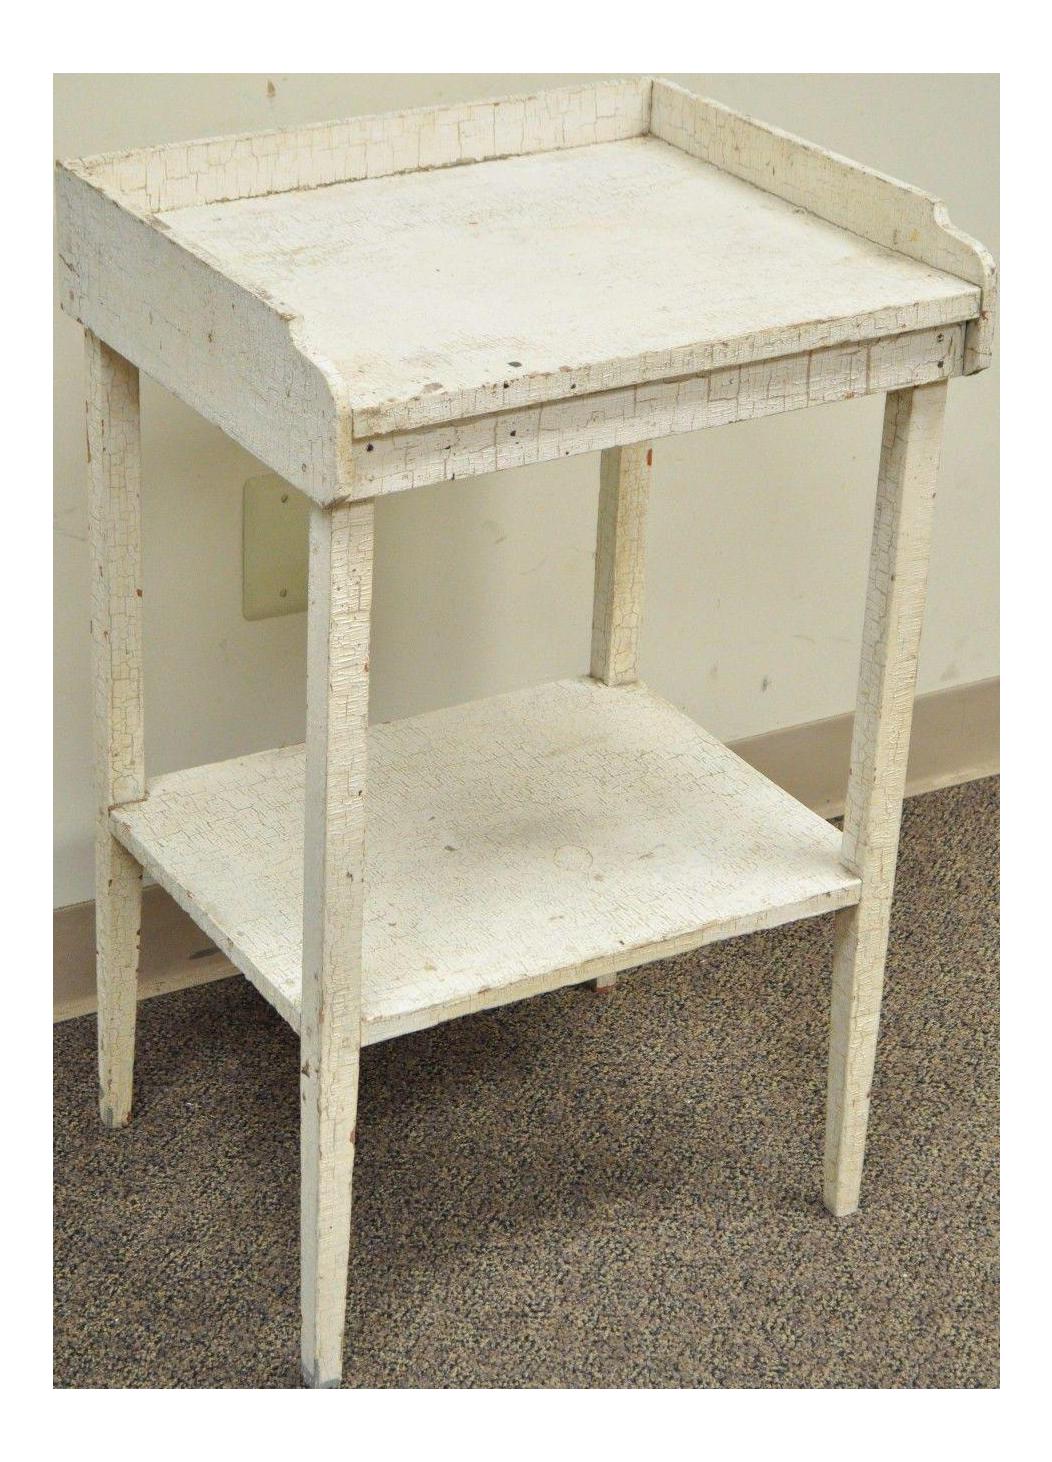 Antique White Distress Painted Pine 2 Tier Accent Side Table Rustic  Primitive